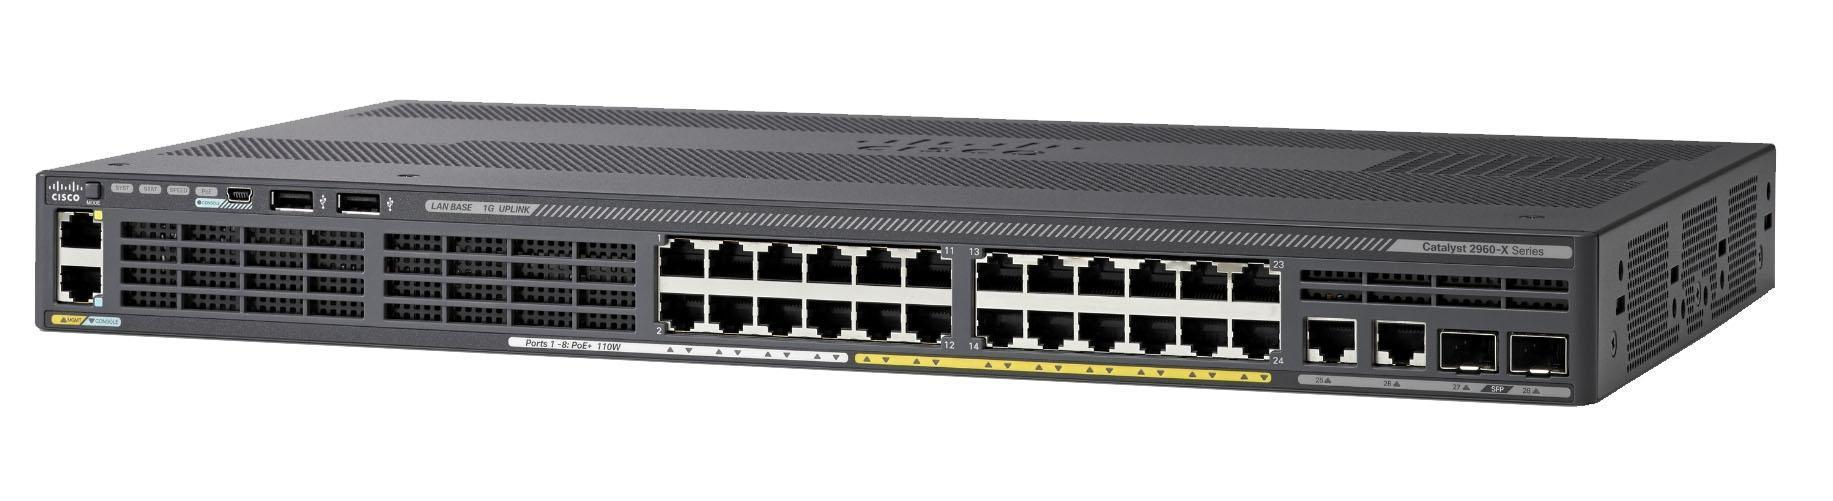 New Cisco 24 Ports Poe Gigabit Network Switch (WS-C2960XR-24PS-I)